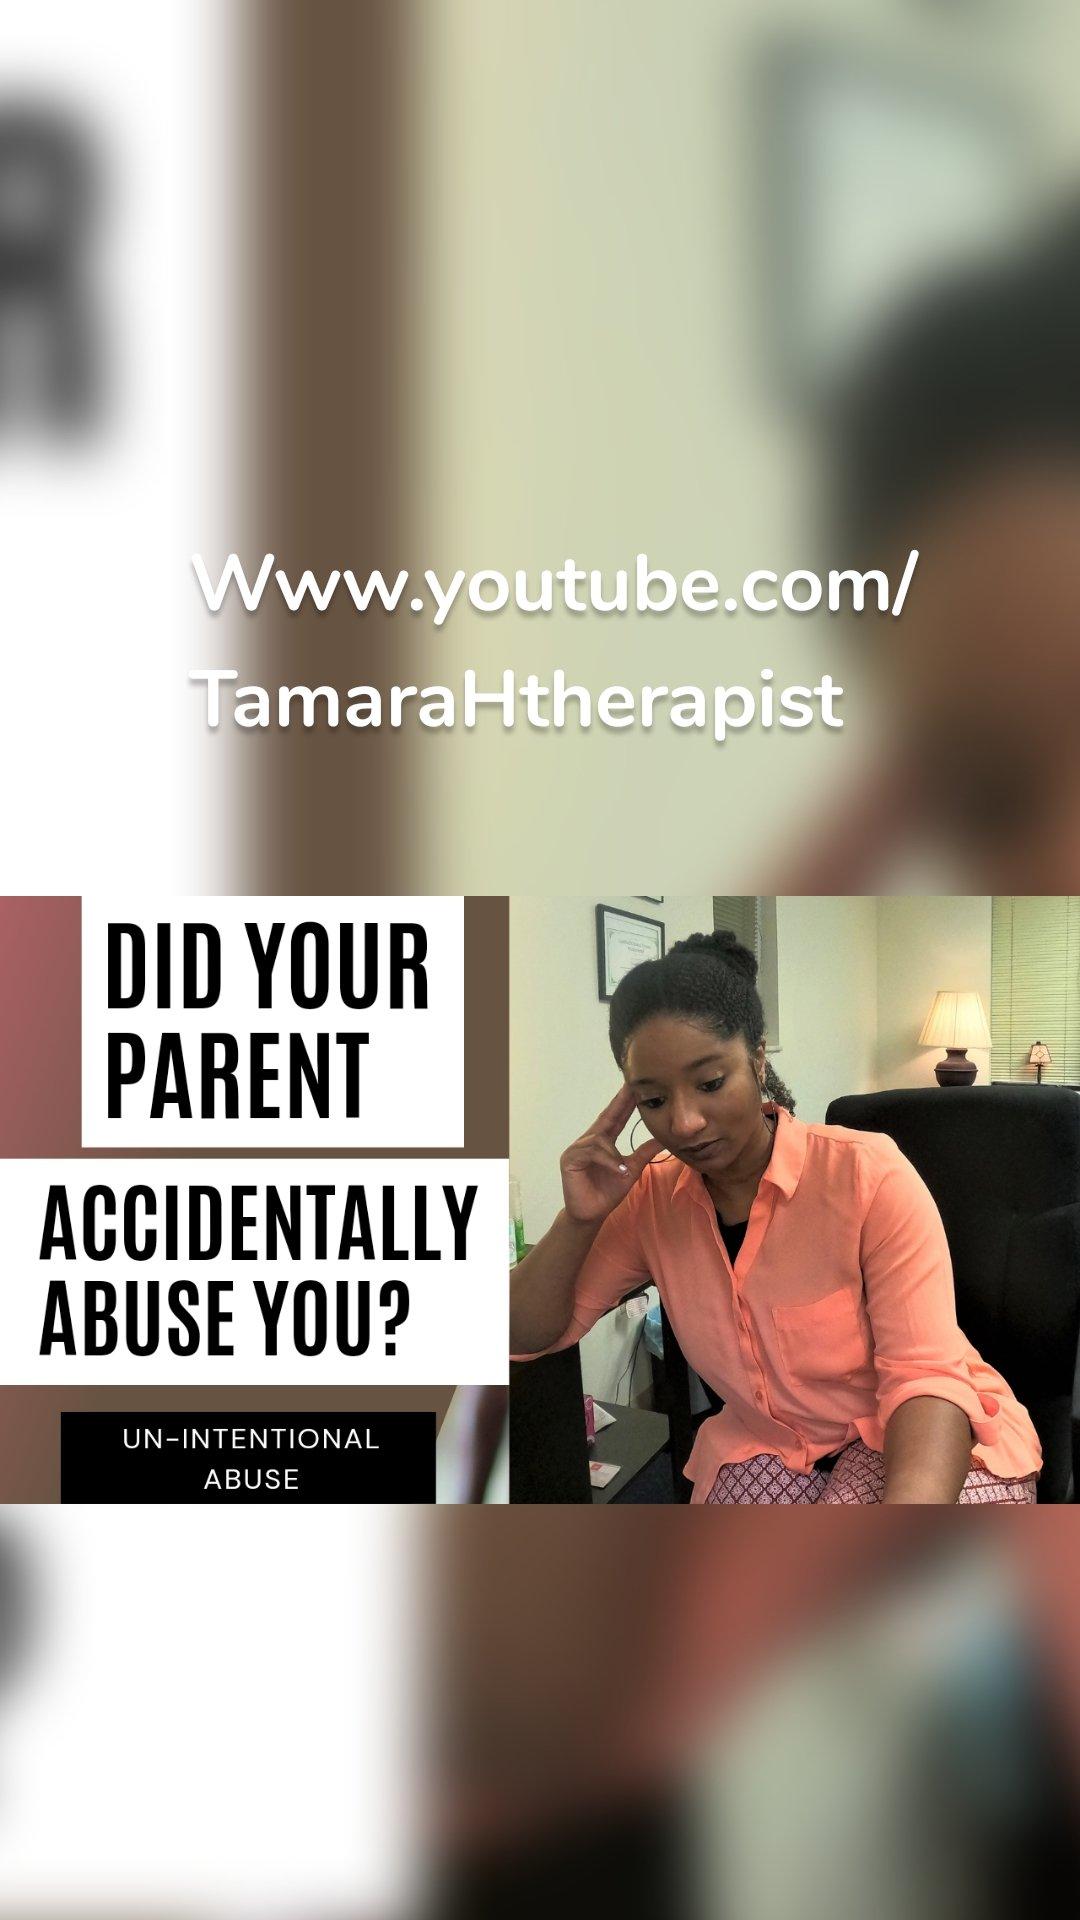 Www.youtube.com/TamaraHtherapist